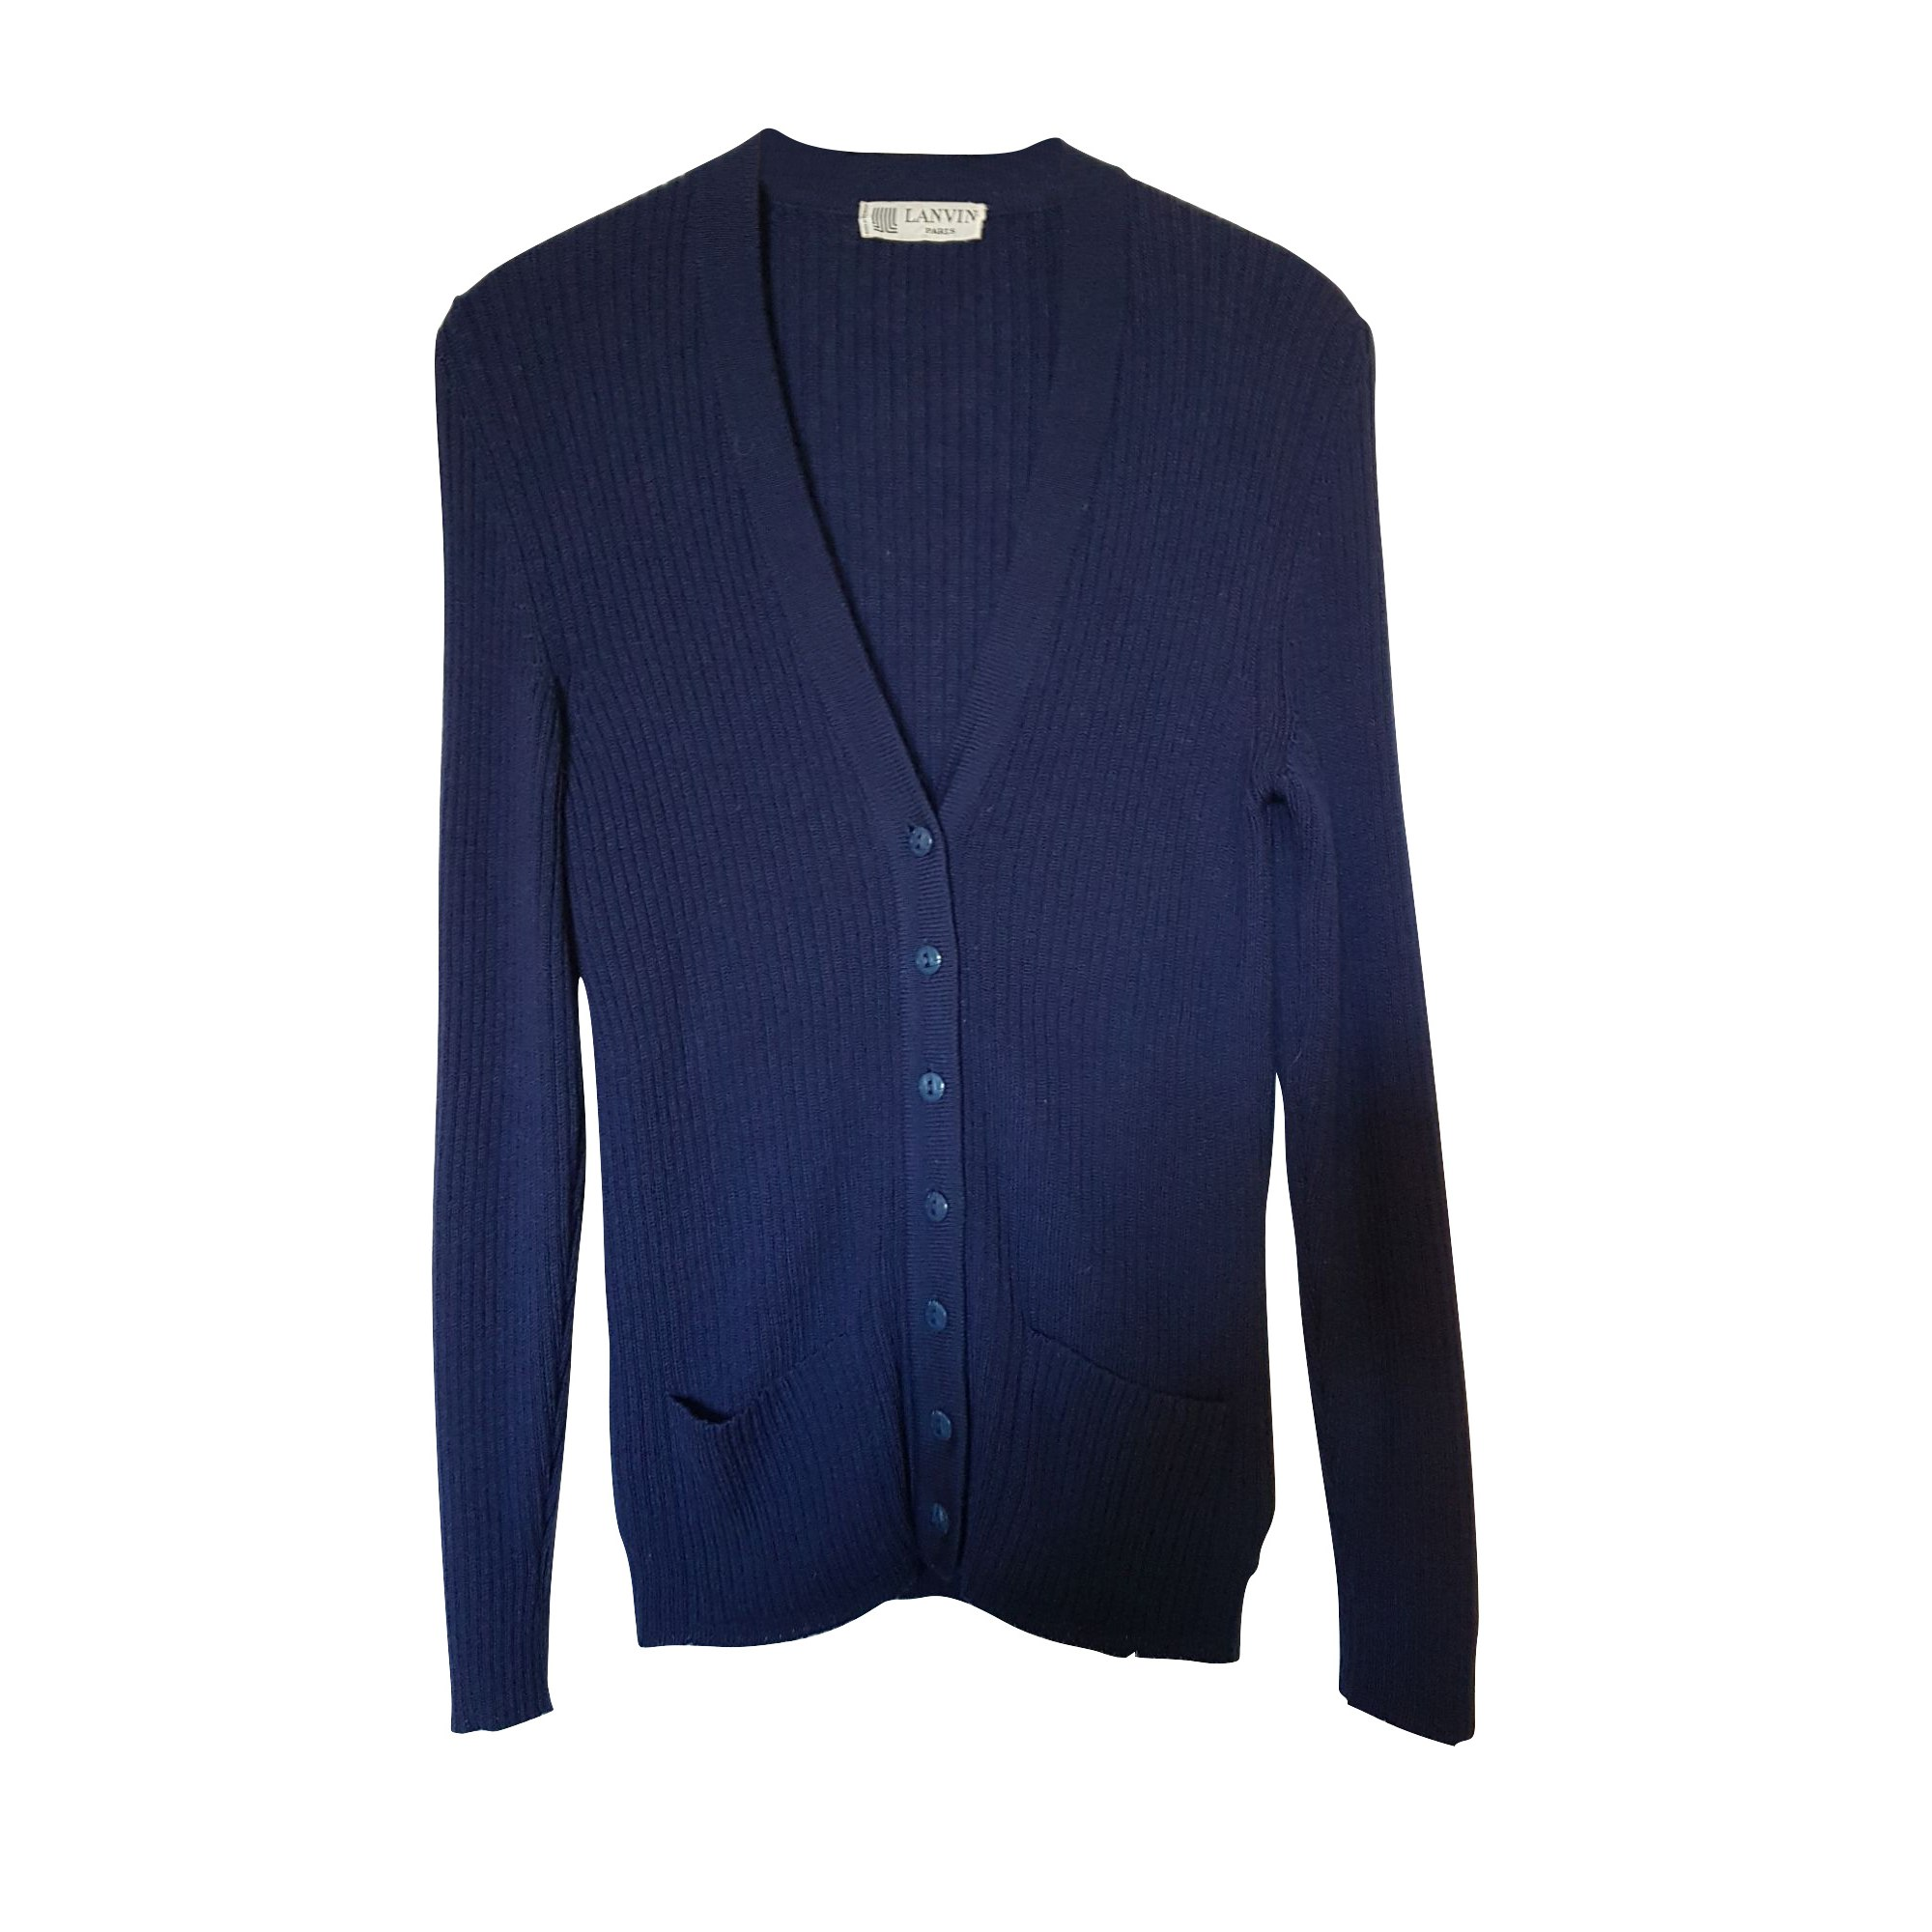 Gilet, cardigan LANVIN Bleu, bleu marine, bleu turquoise